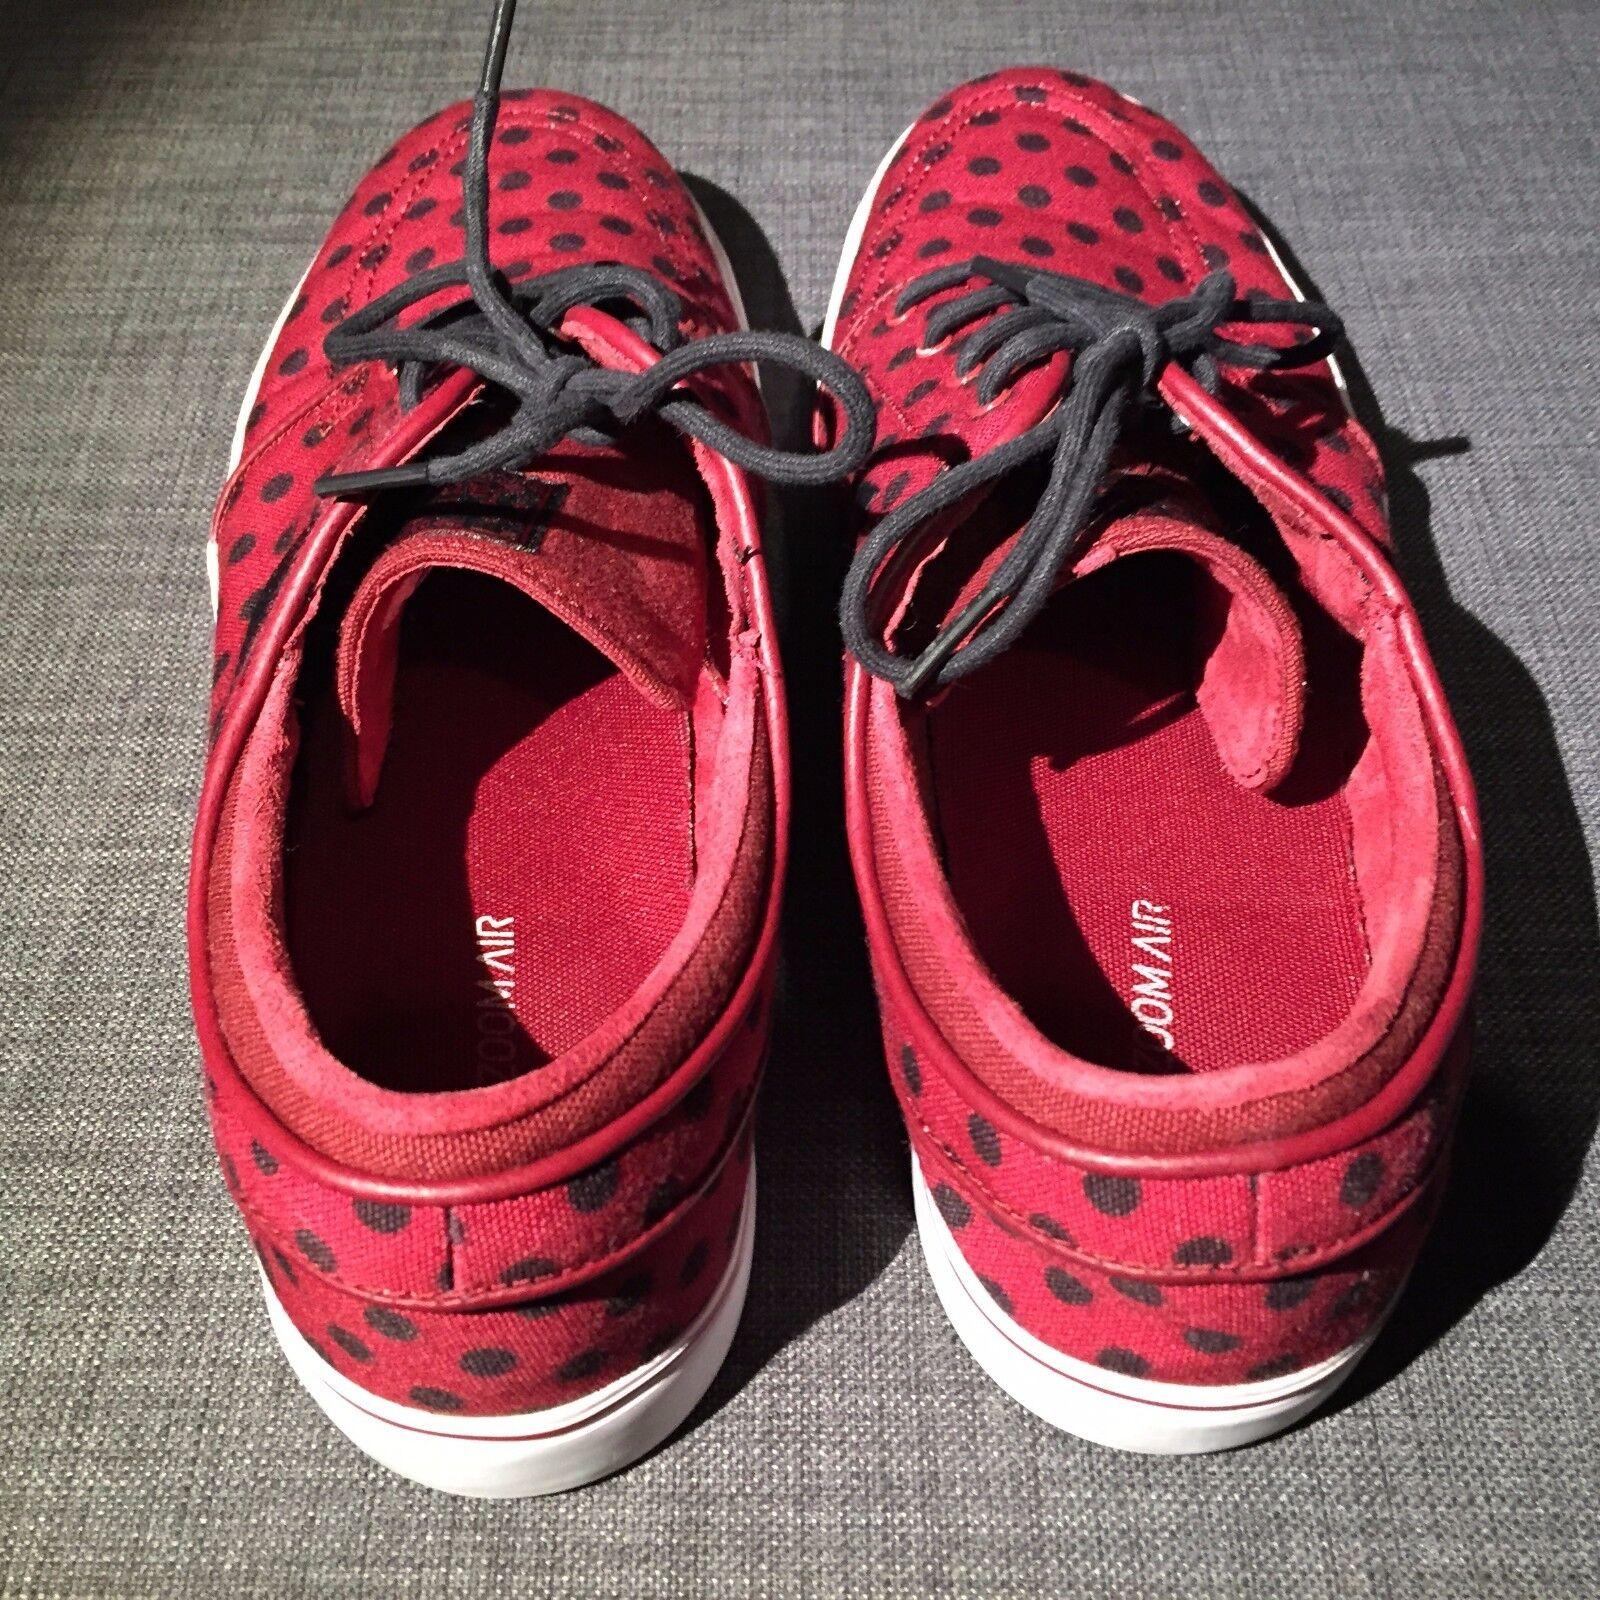 Nike libera rn proposta fk fk proposta 2017 scarpe volt blu e nero Uomo 10,5 flyknit cloro 3fbc06